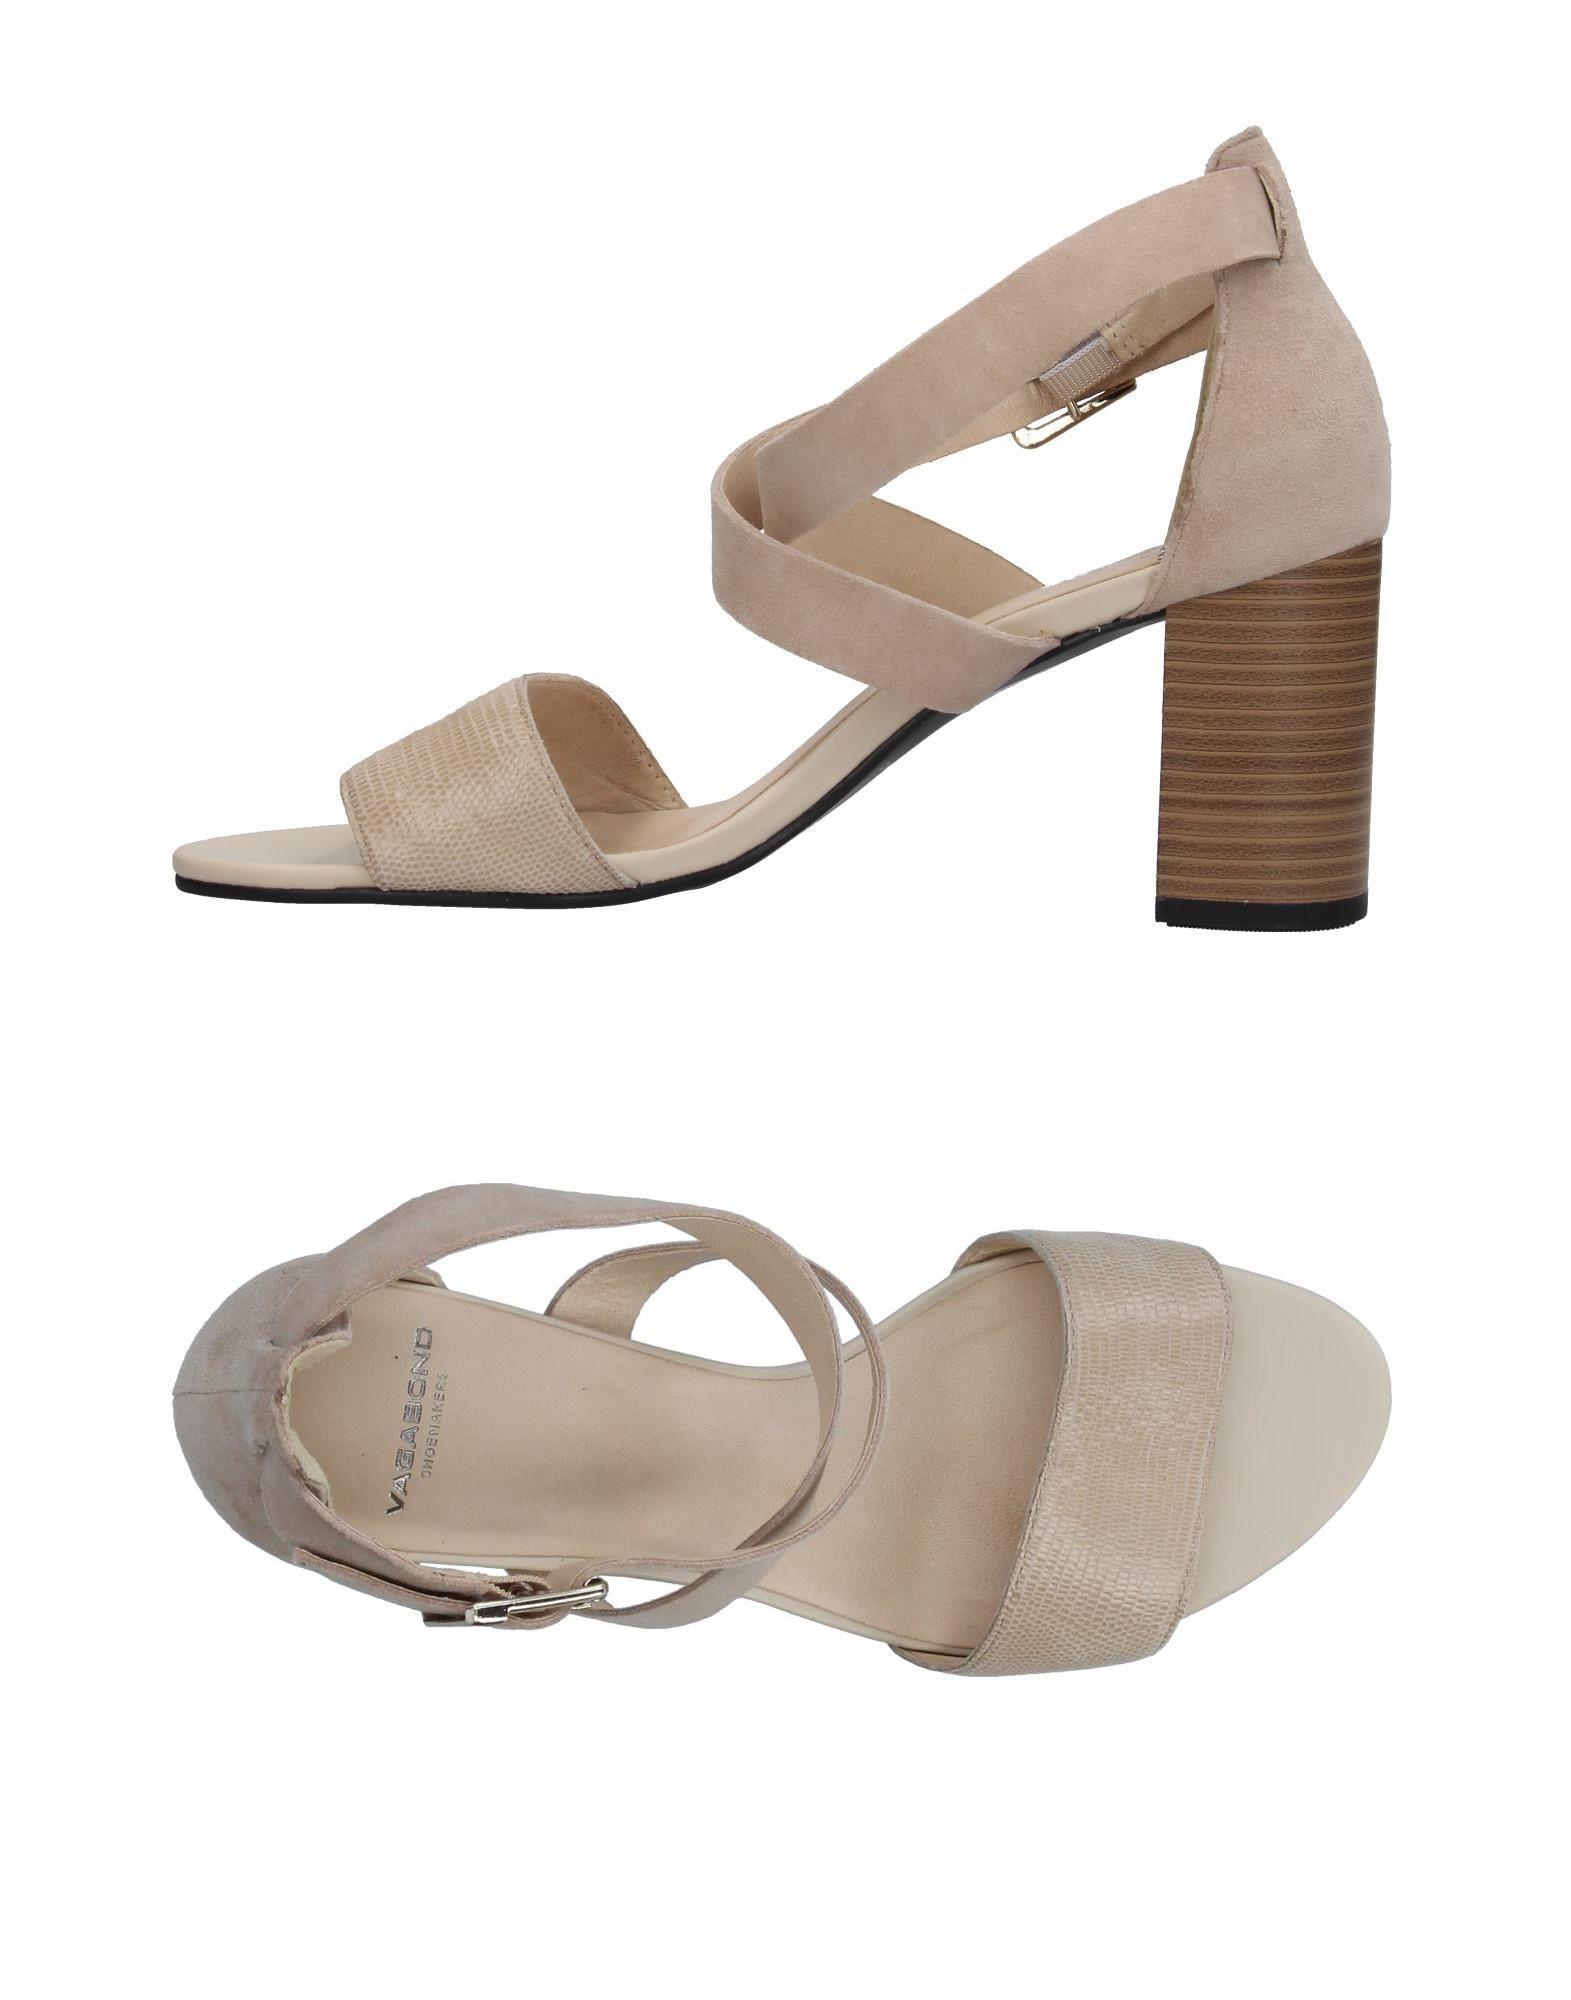 Sandali Vagabond Shoemakers Donna - 11369802MF